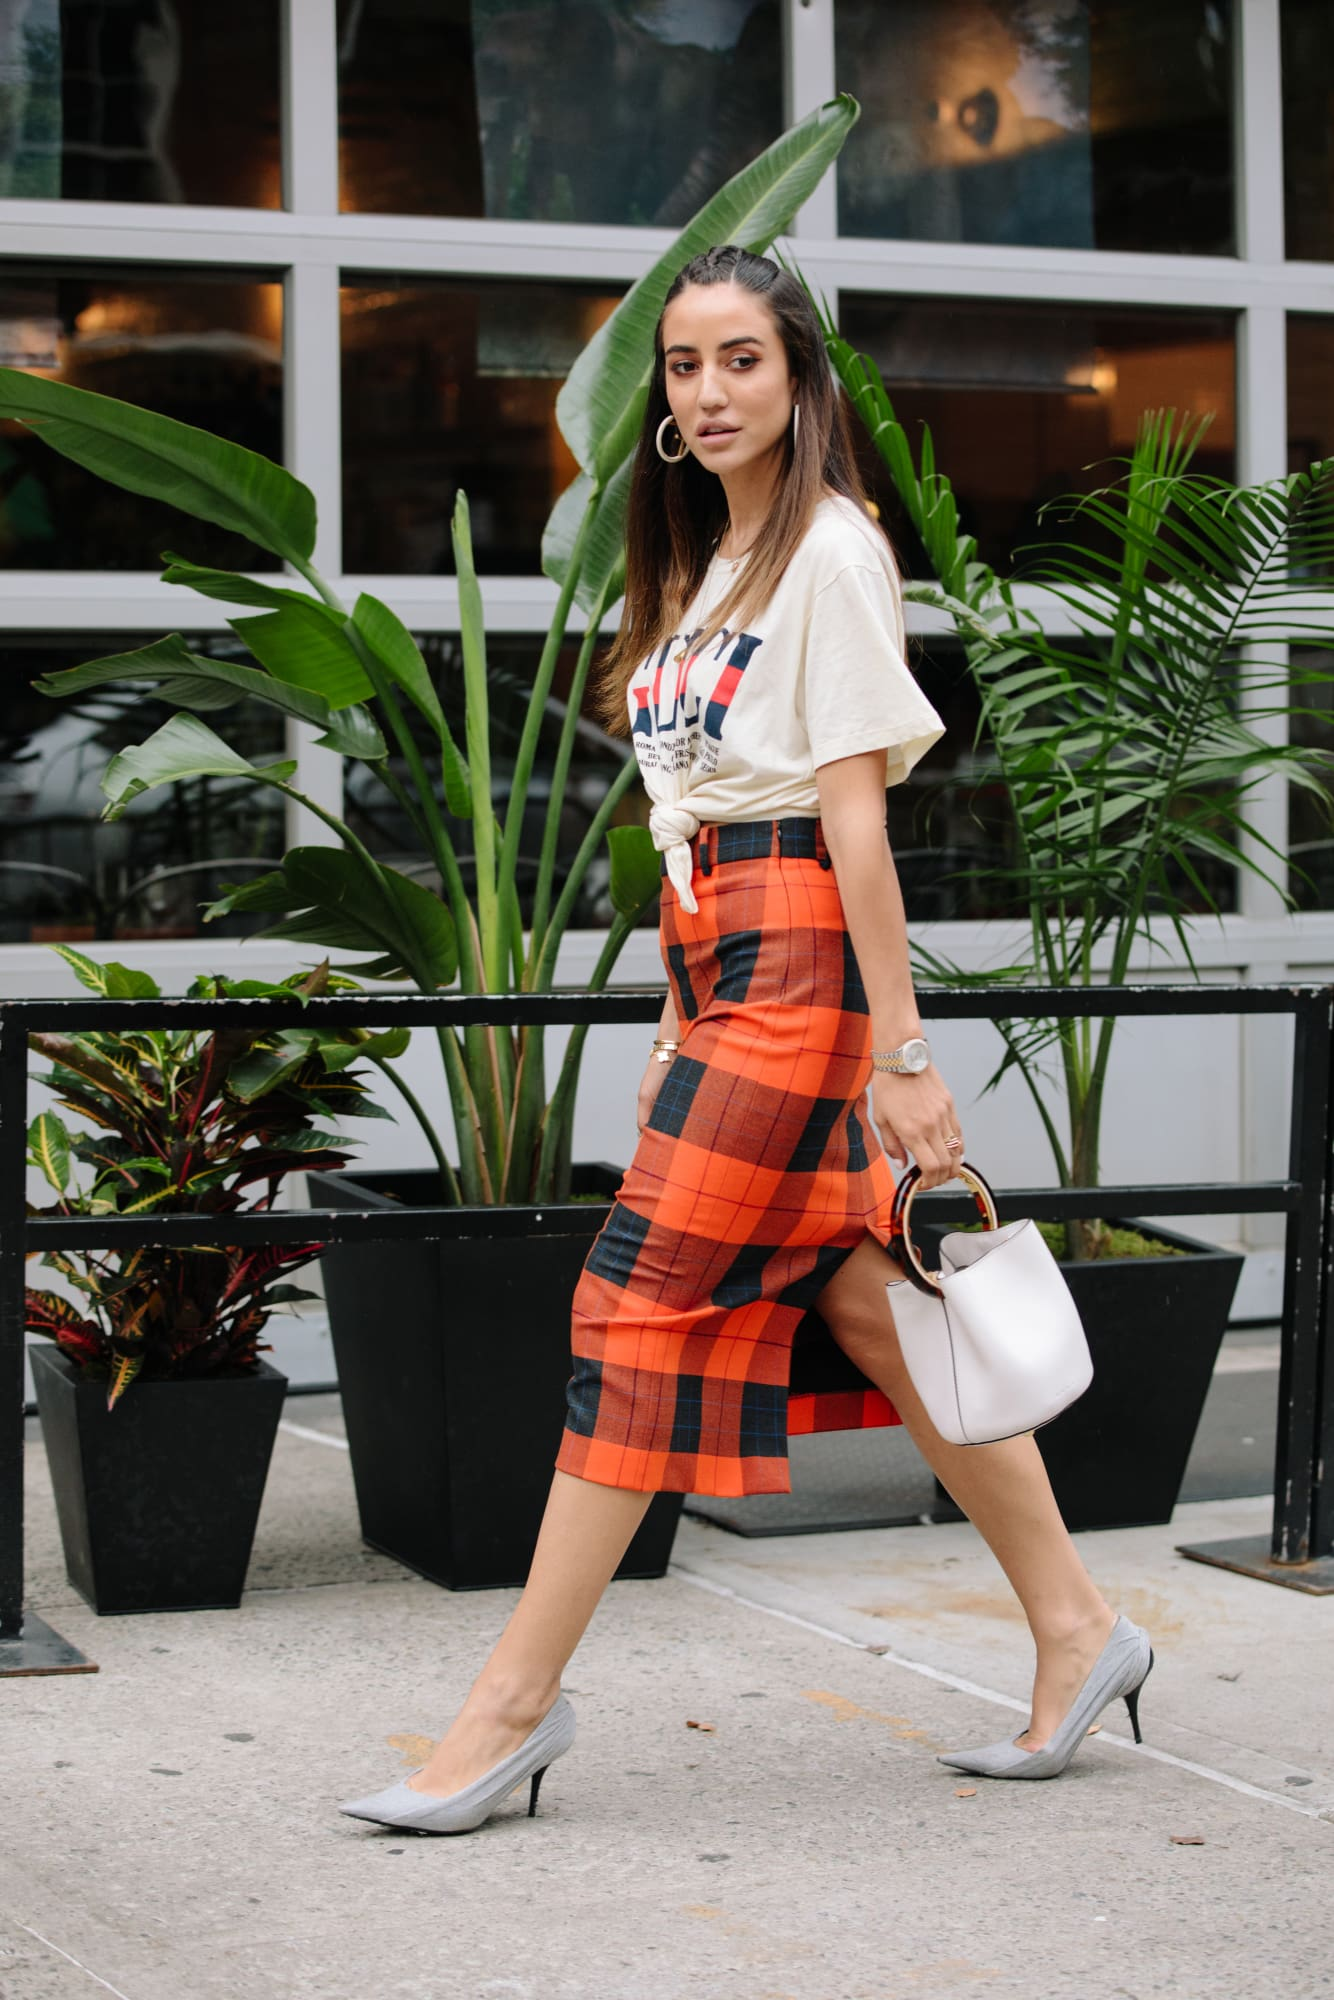 new-york-fashion-week-street-style-spring-2019-day-3-22.jpg